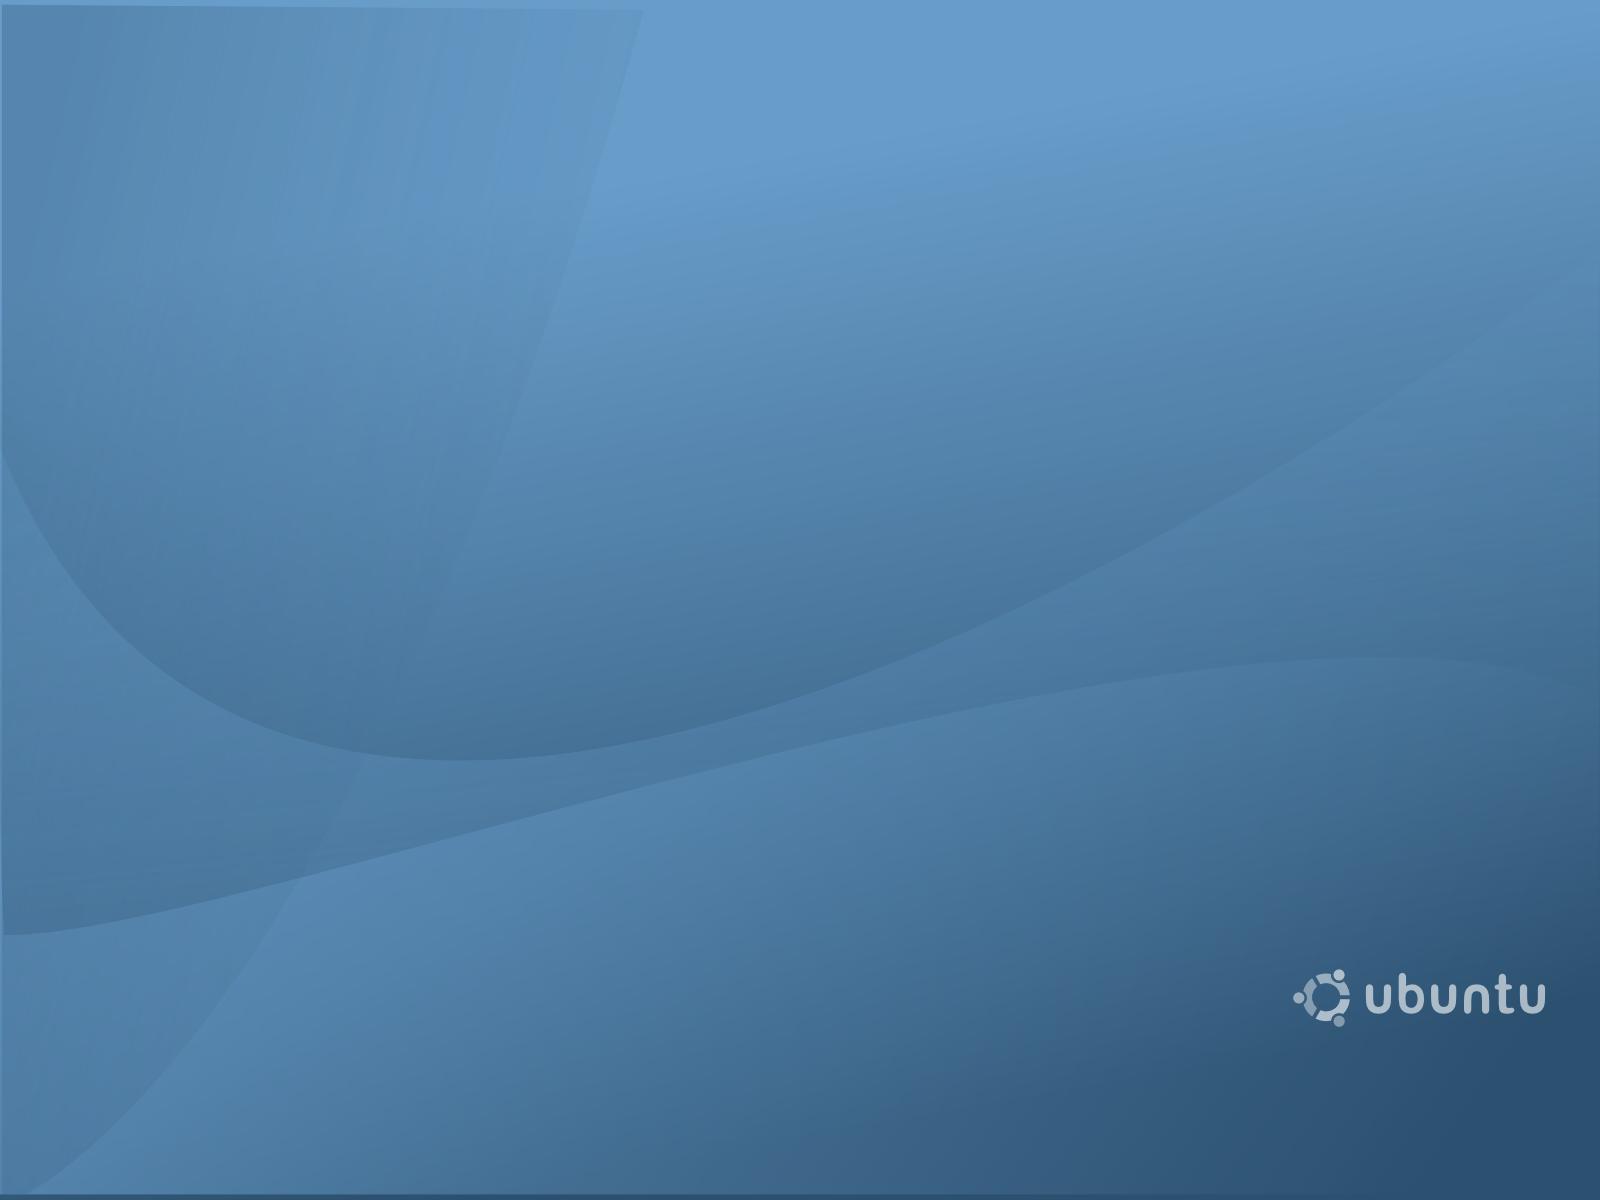 Ubuntu Blue by ngnr